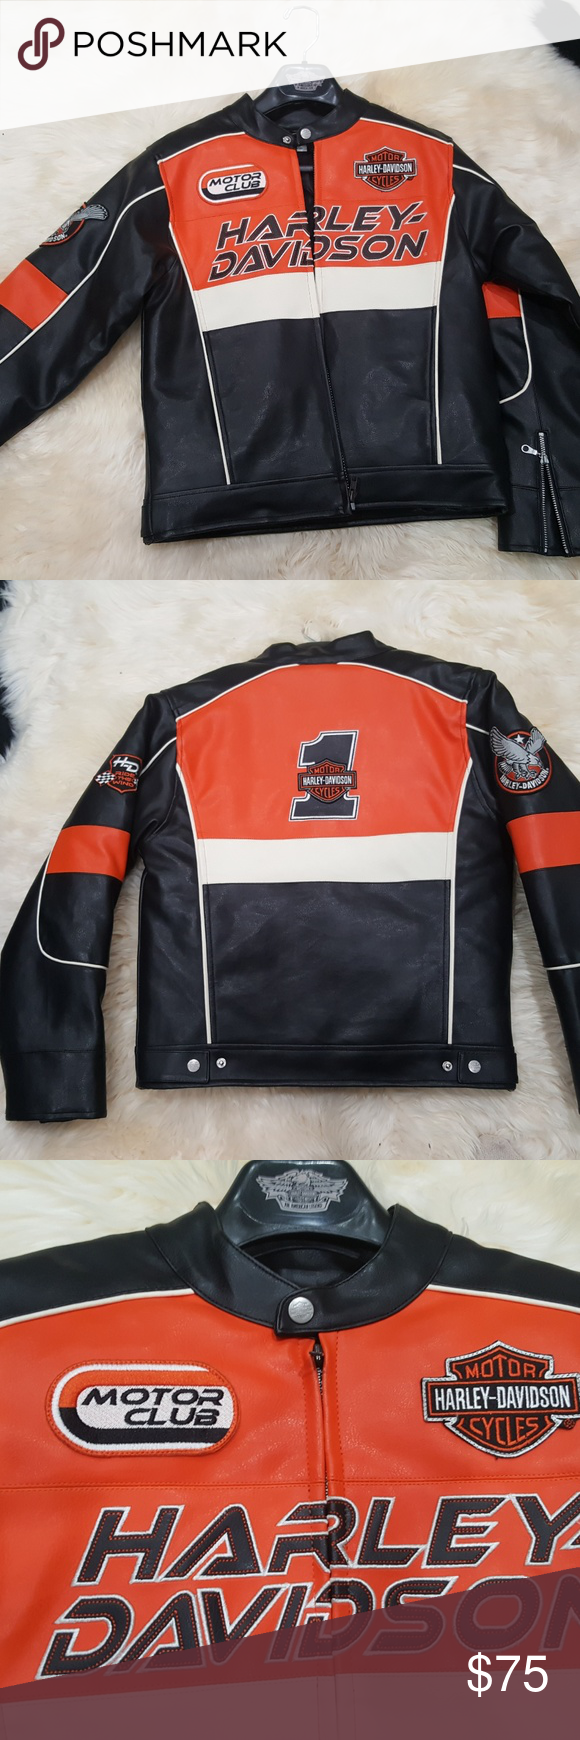 Harley Davidson Leather Jacket Kids Size M 12 14 Harley Davidson Leather Jackets Kids Jacket Jackets [ 1740 x 580 Pixel ]